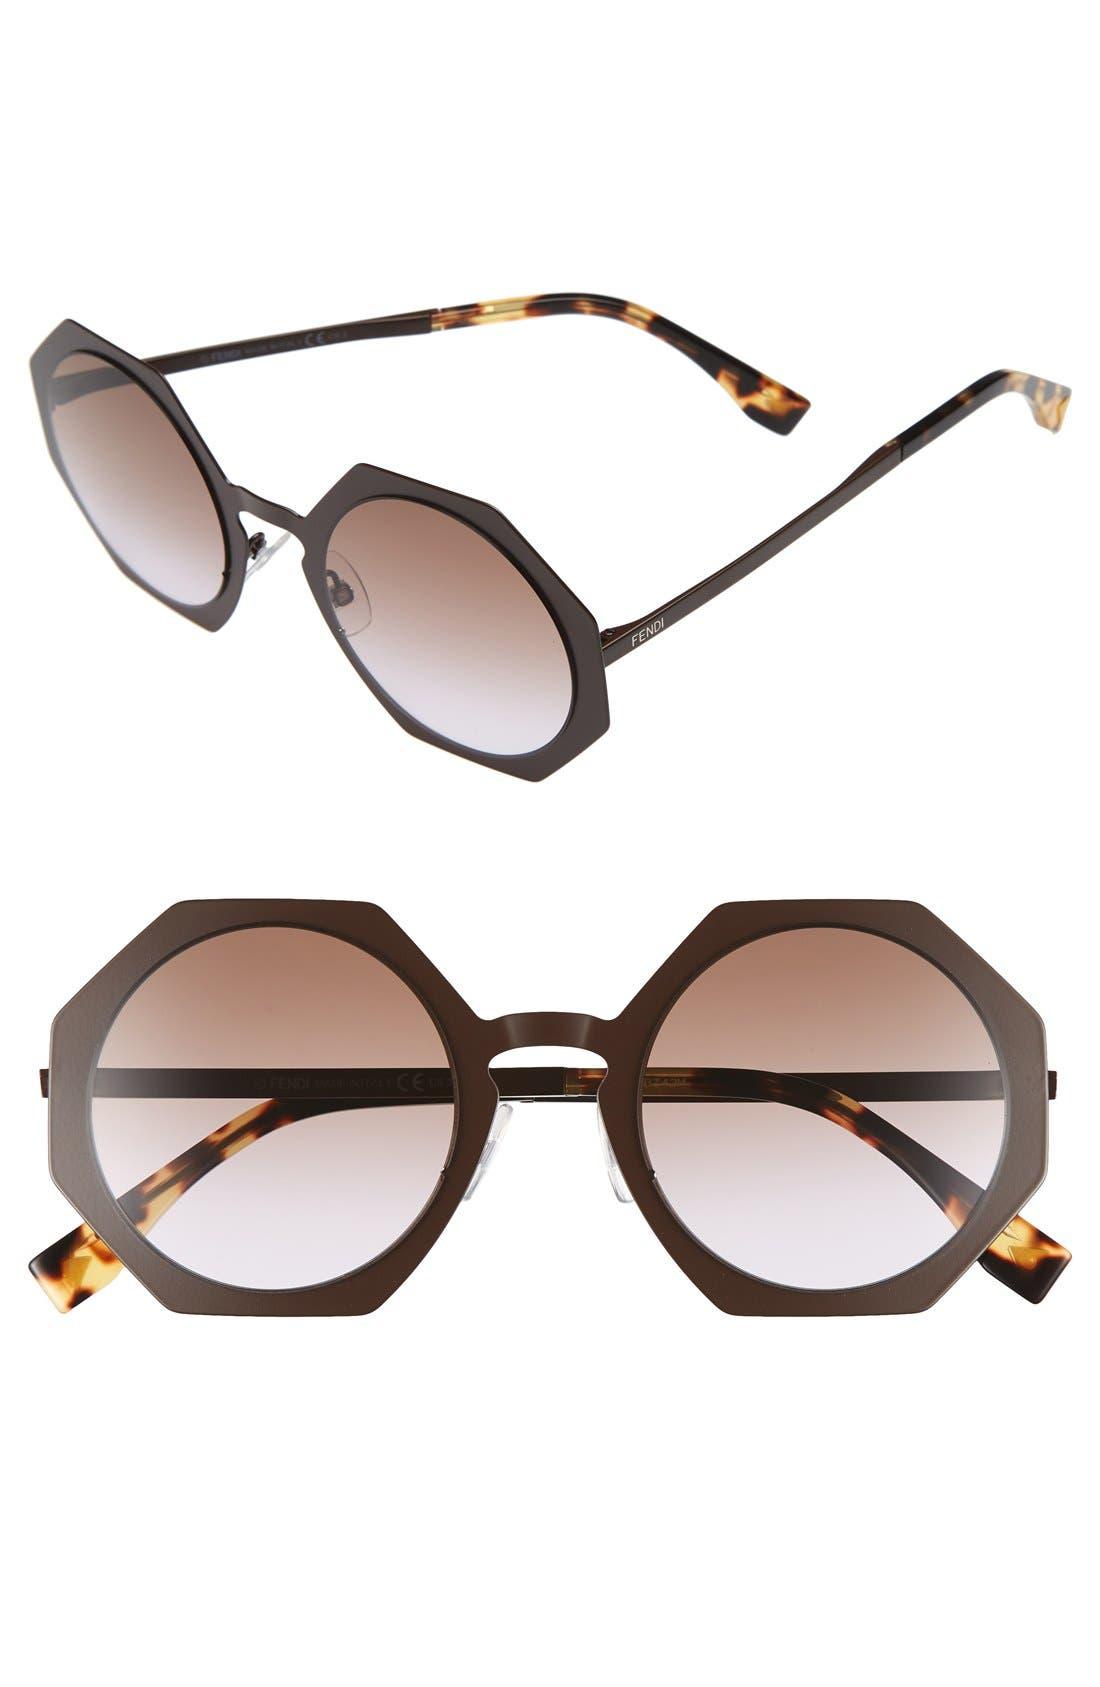 51mm Retro Octagon Sunglasses,                             Main thumbnail 1, color,